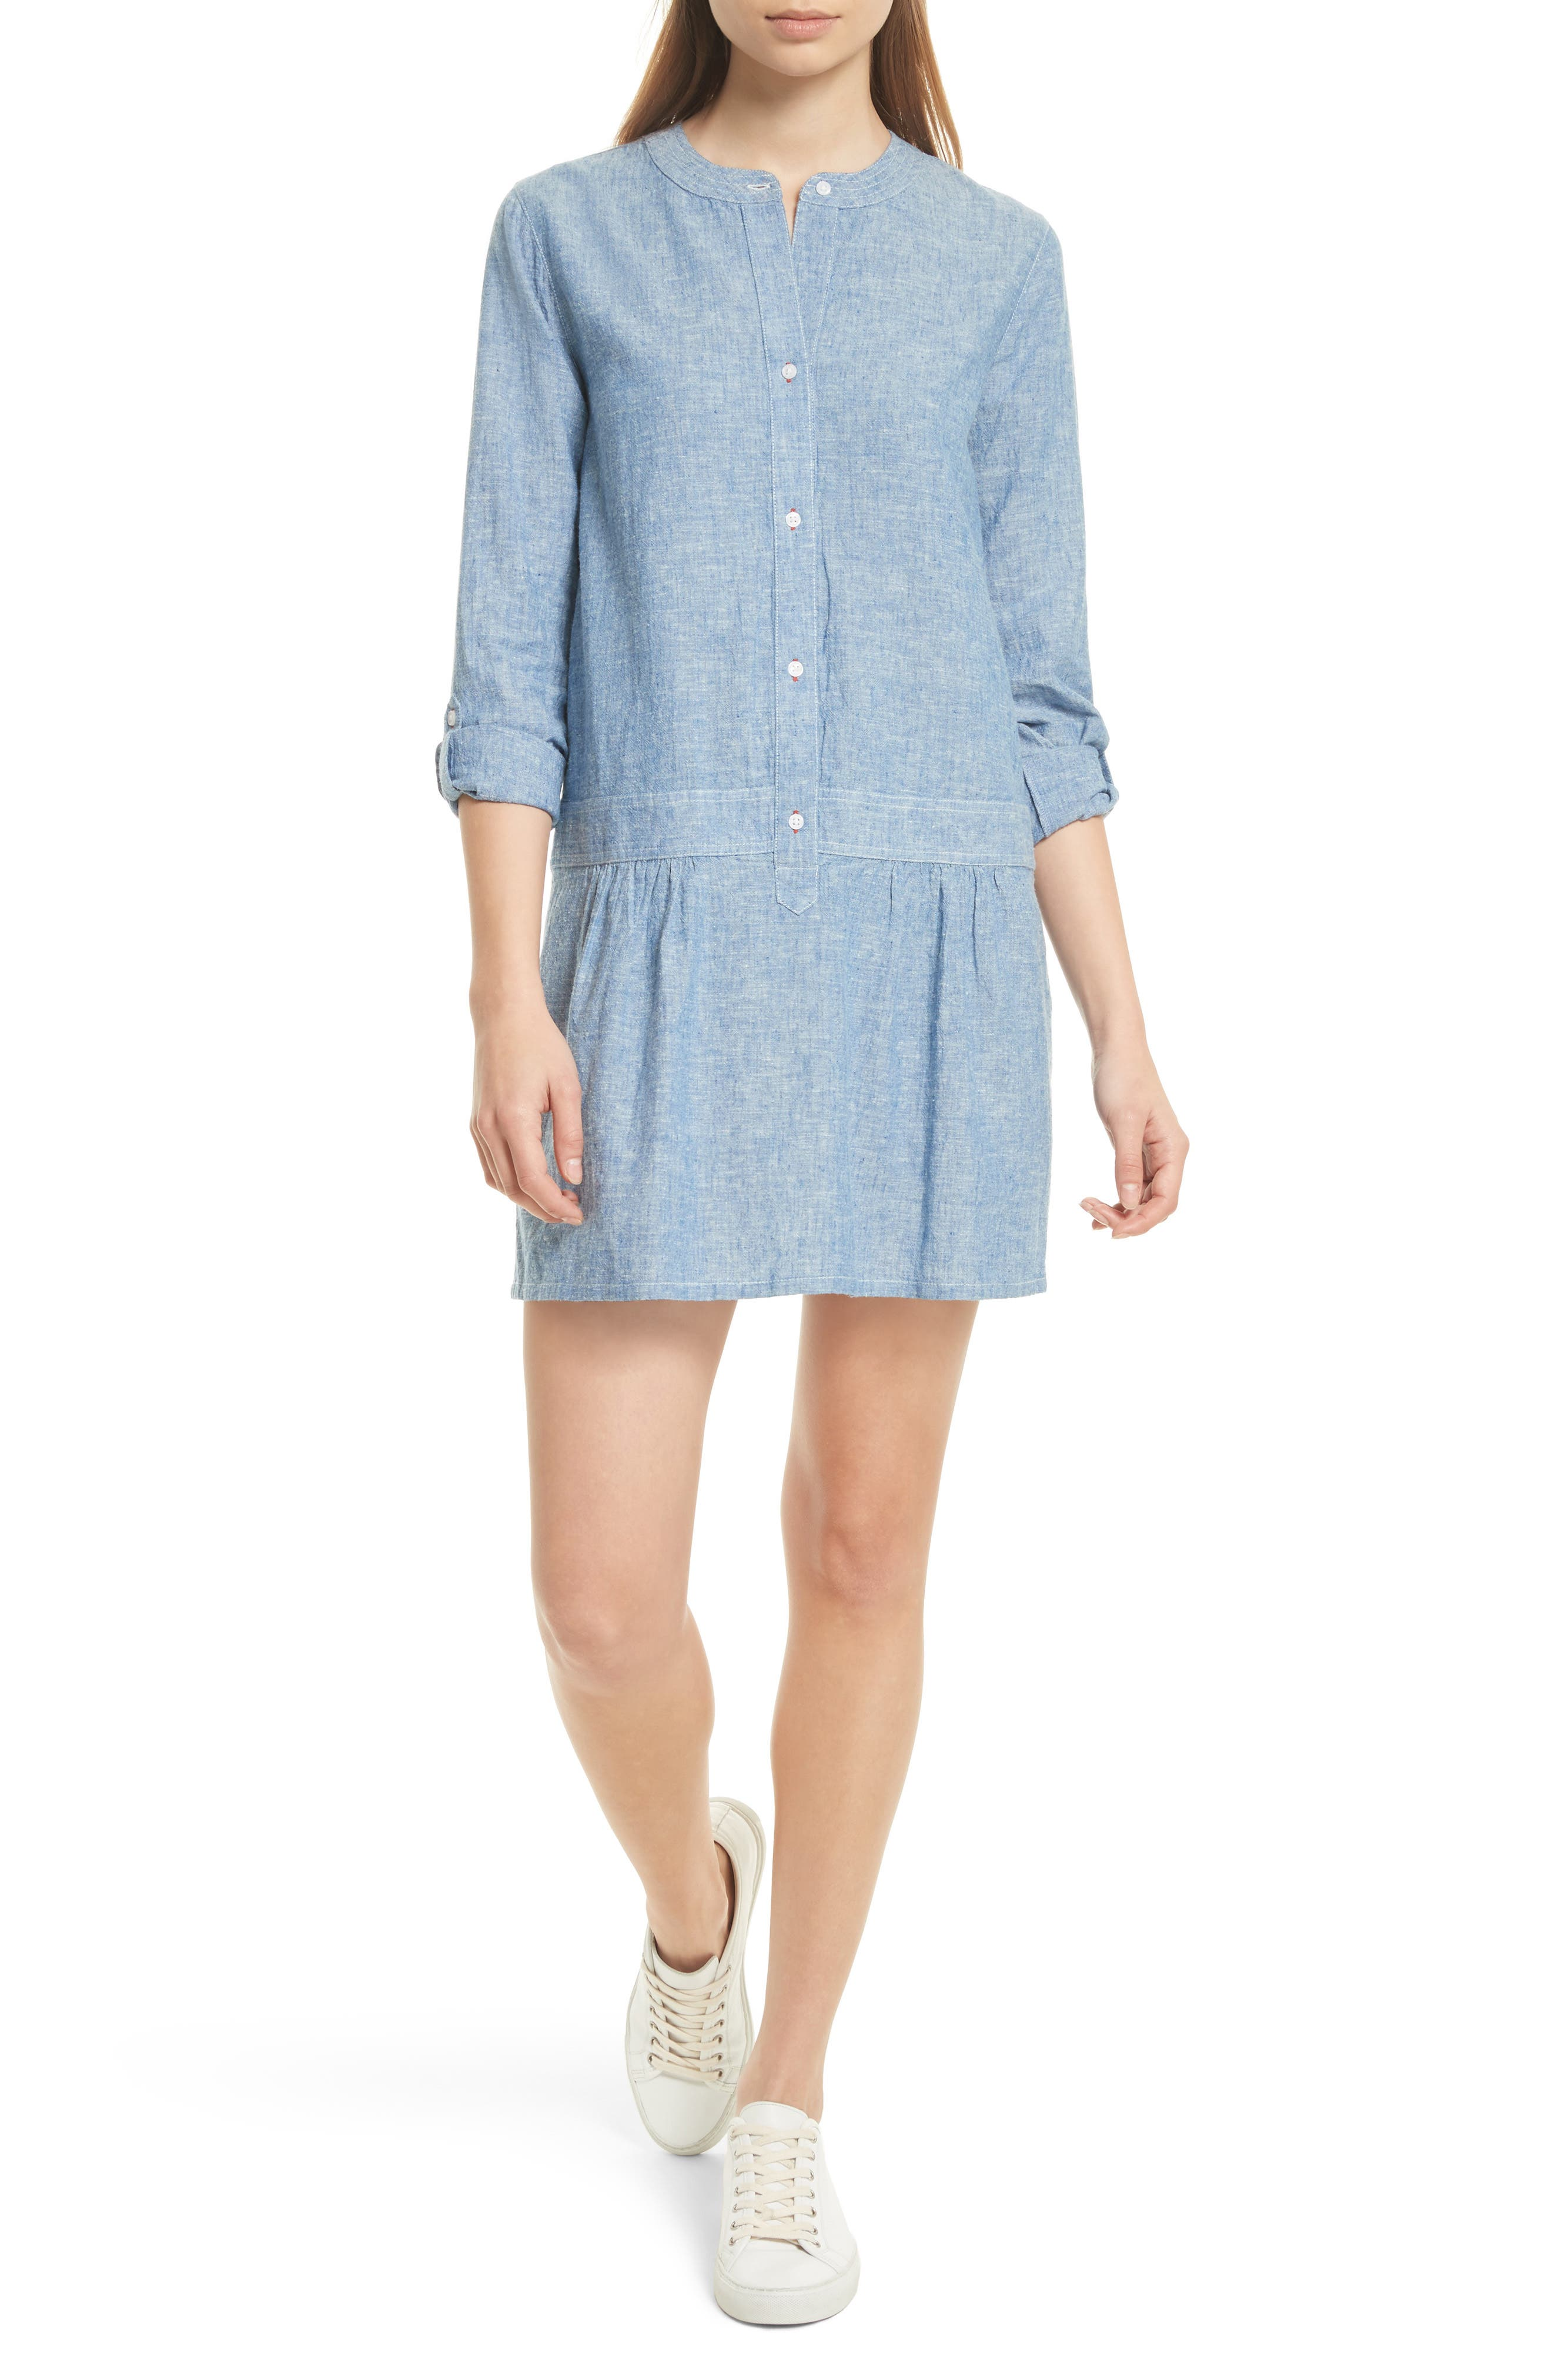 Alternate Image 1 Selected - Soft Joie Amiri Chambray Shirtdress